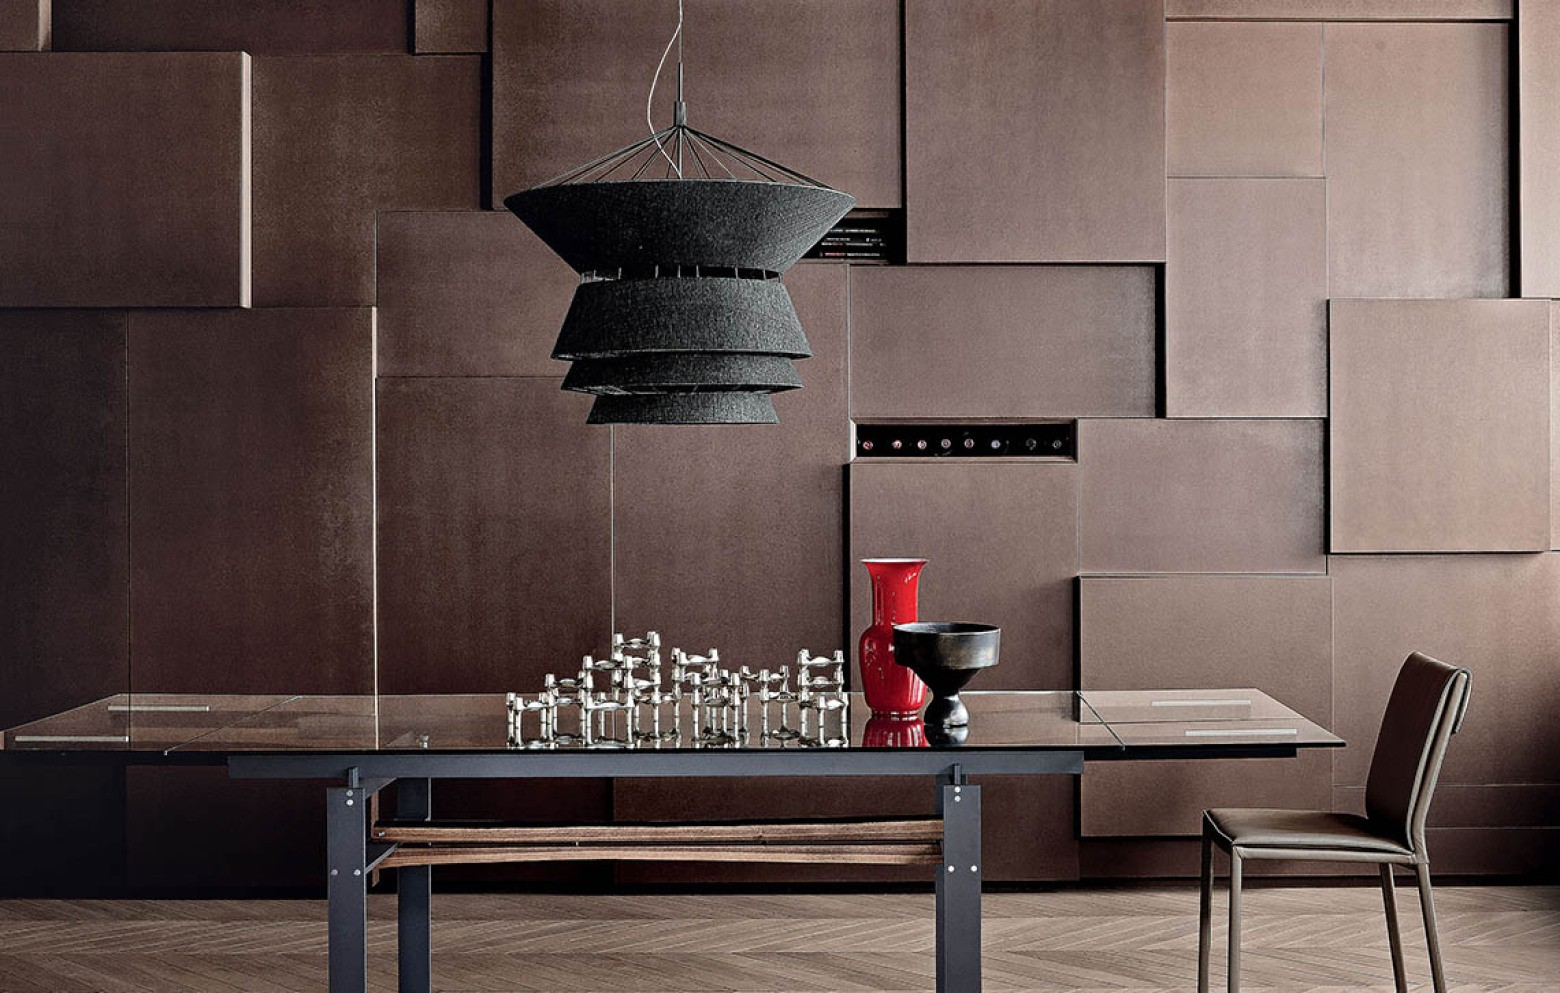 bolero h ngelampe lampen kleinm bel accessoires who 39 s perfect. Black Bedroom Furniture Sets. Home Design Ideas